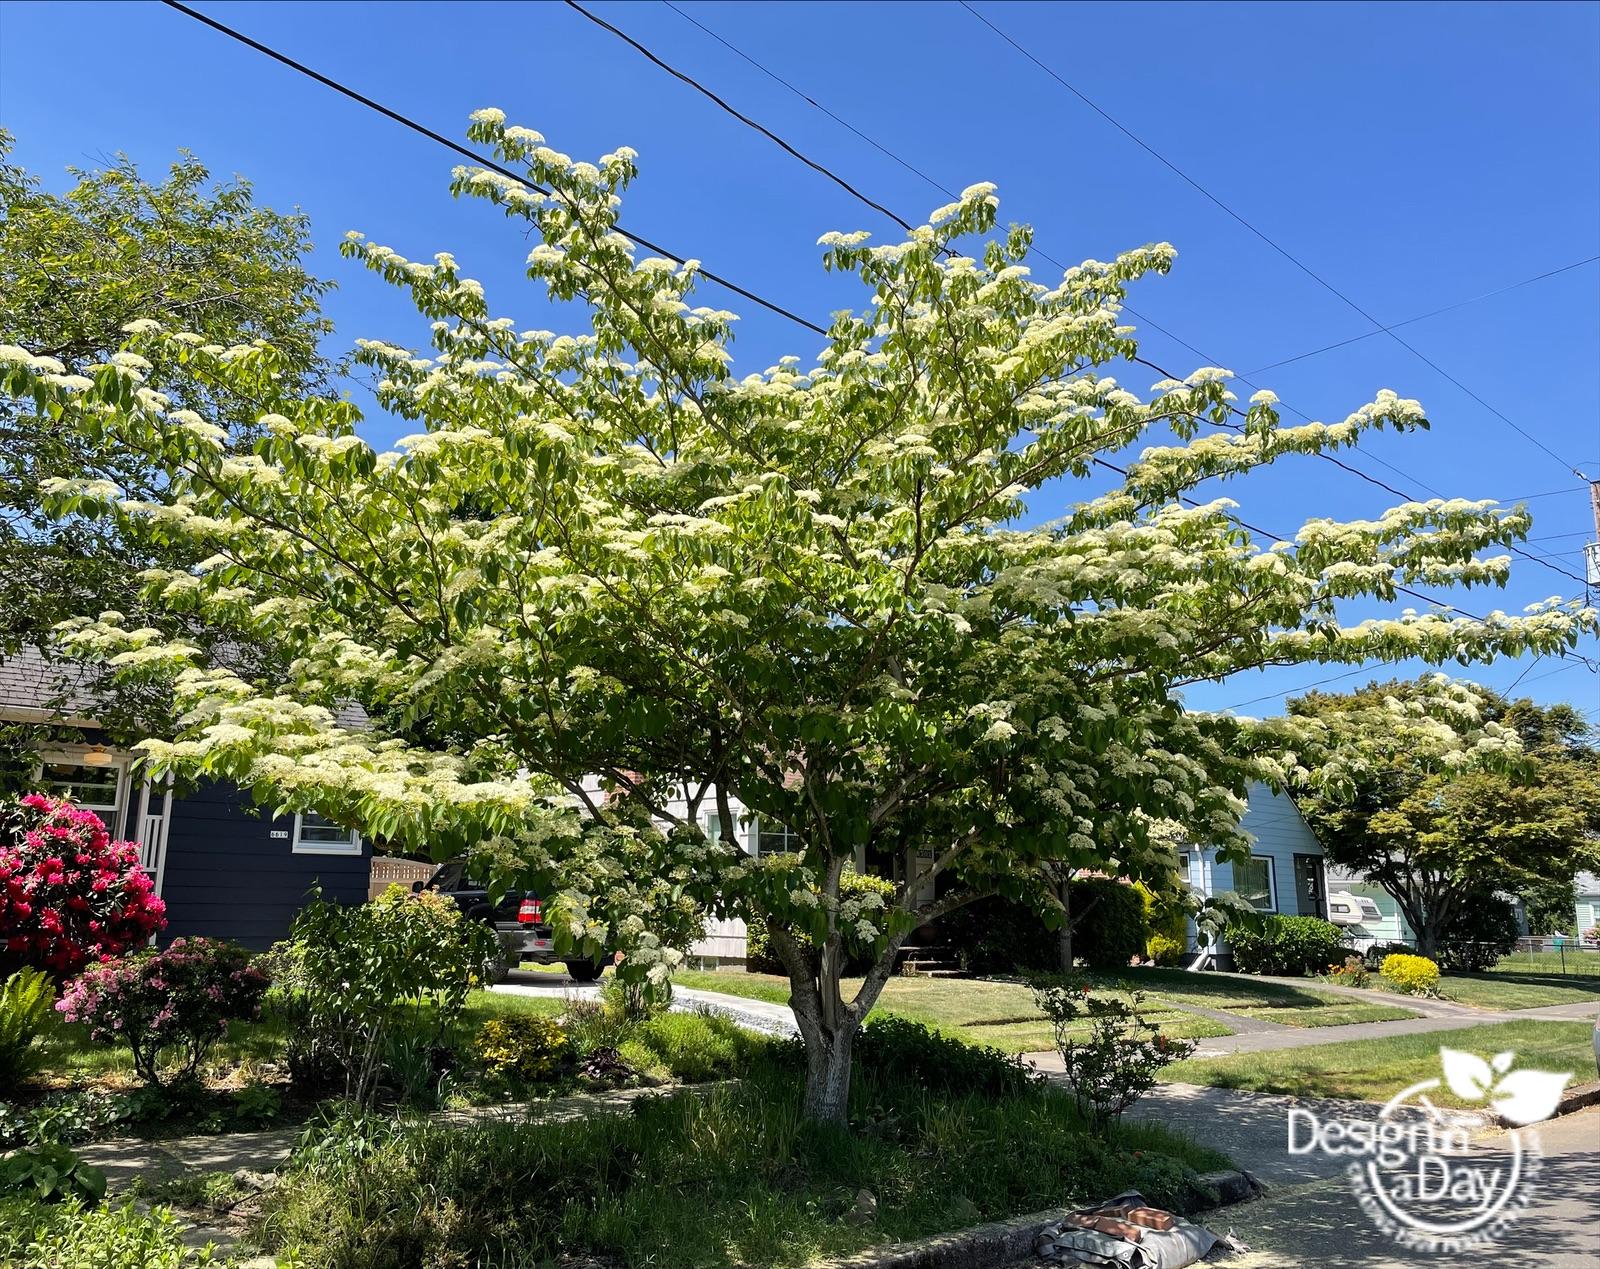 Overlook neighborhood has Dogwood 'June Snow' in parking strip - close up of flower.